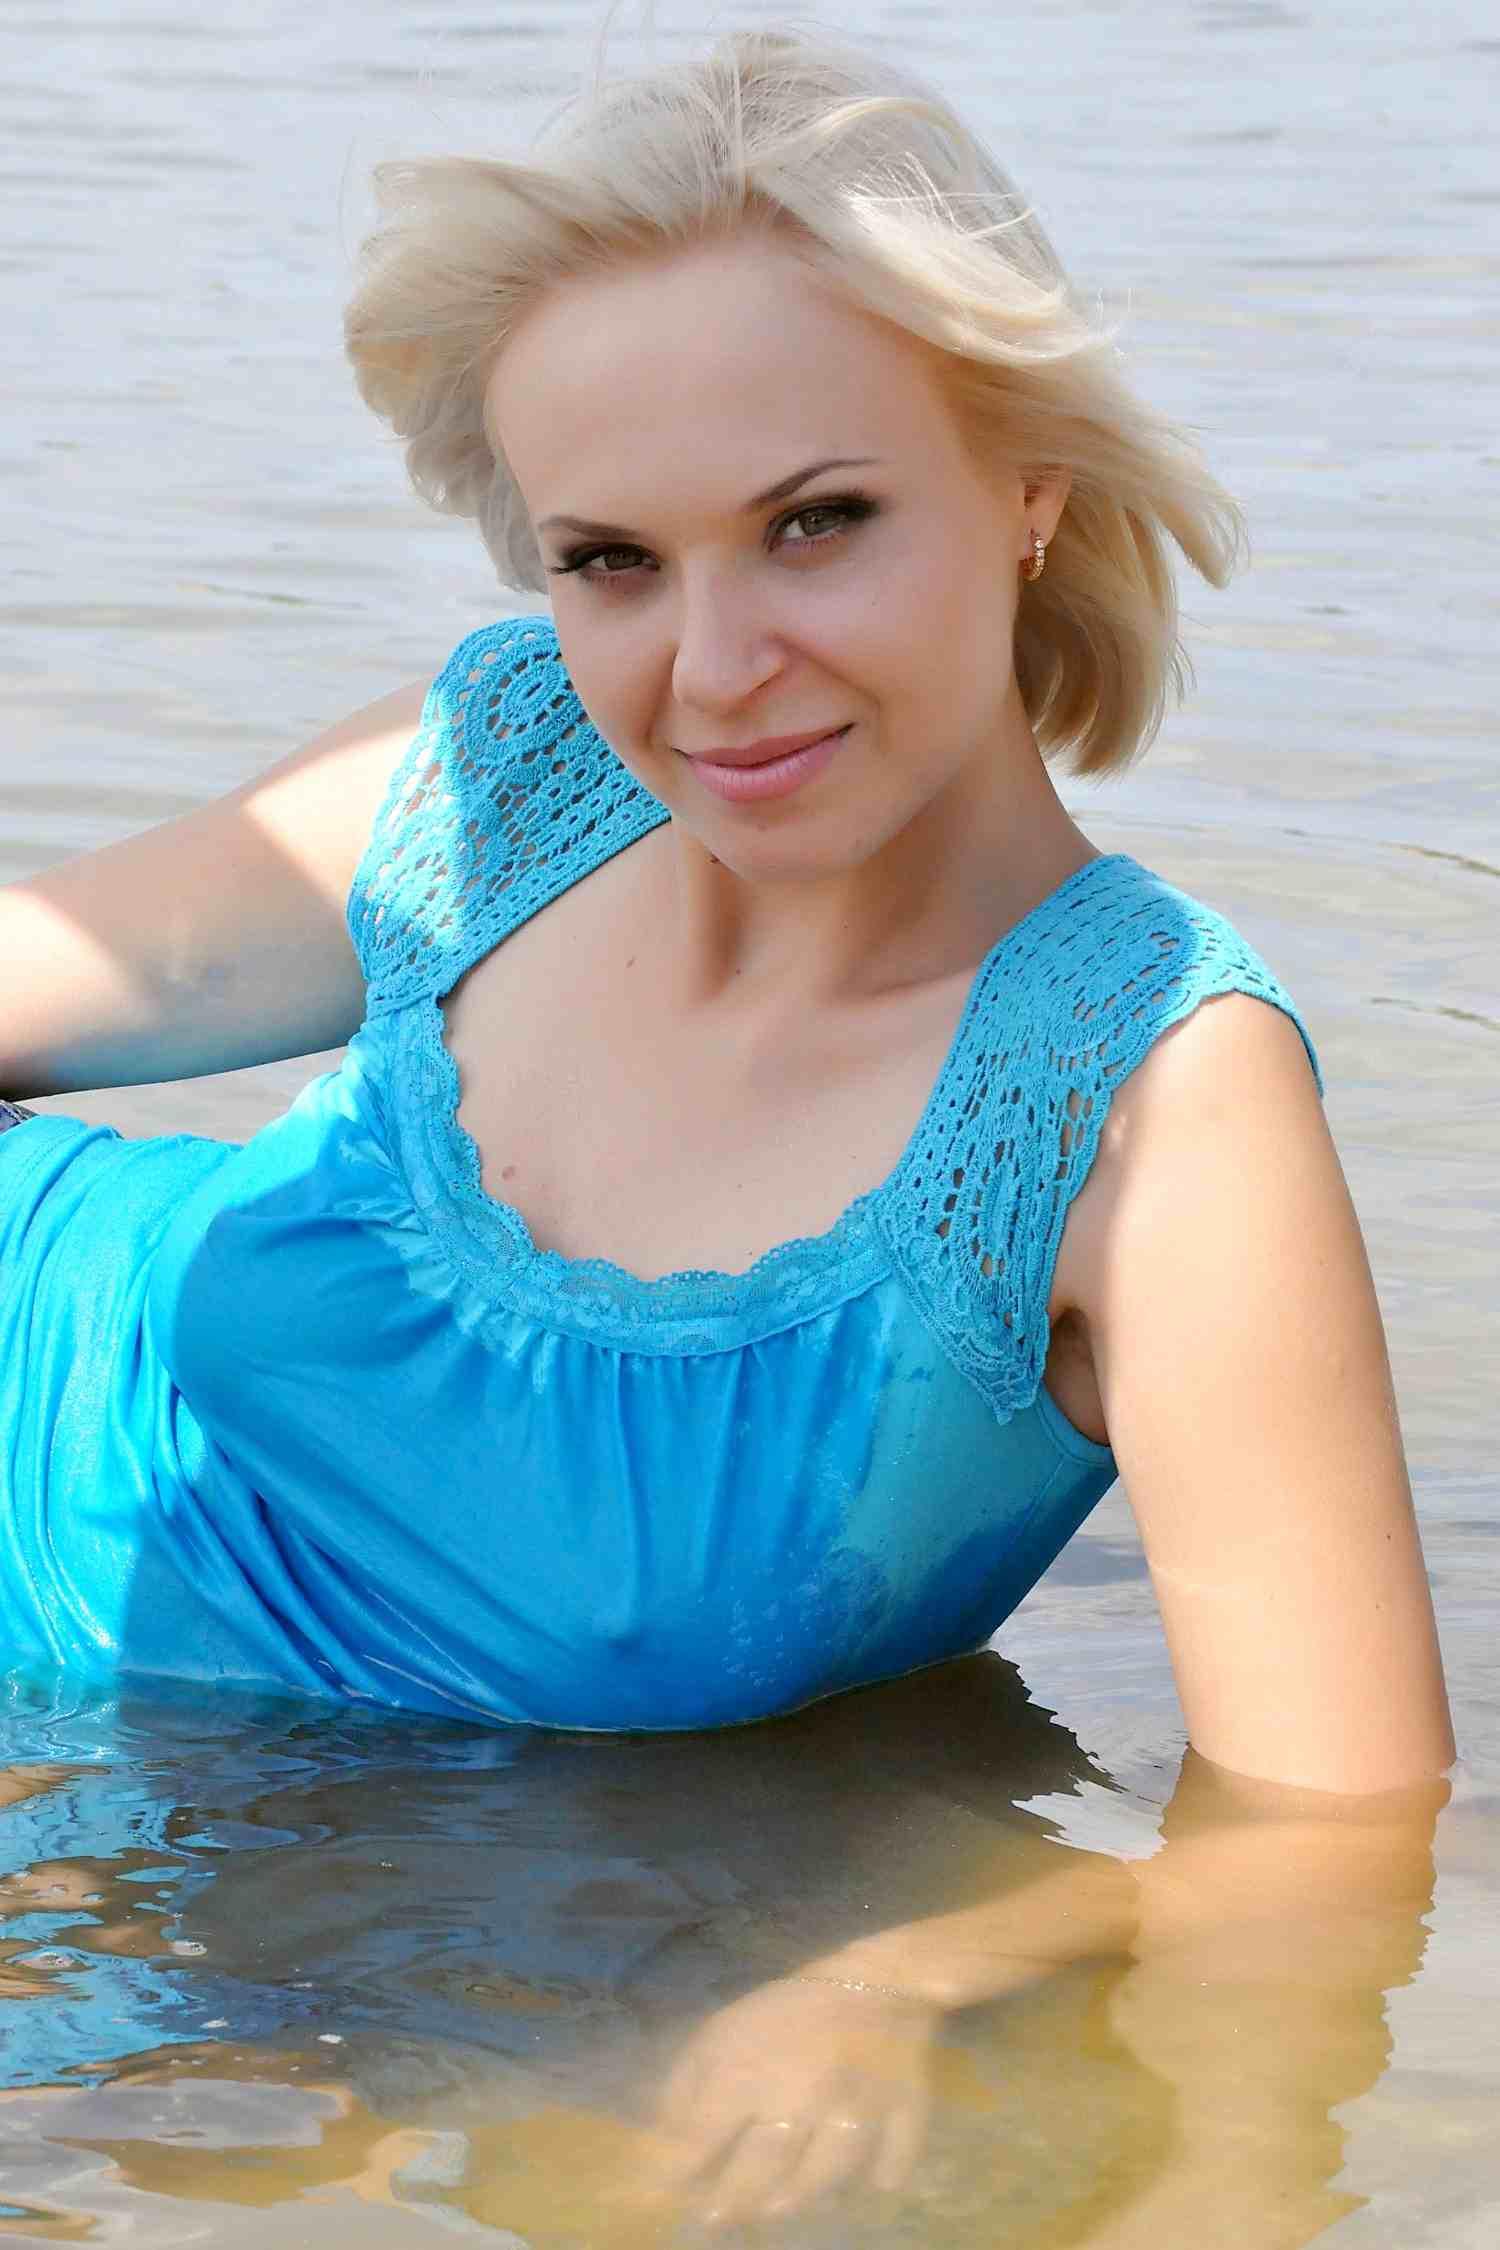 Www.big hips and BBW photo xxx.com-qualité porno